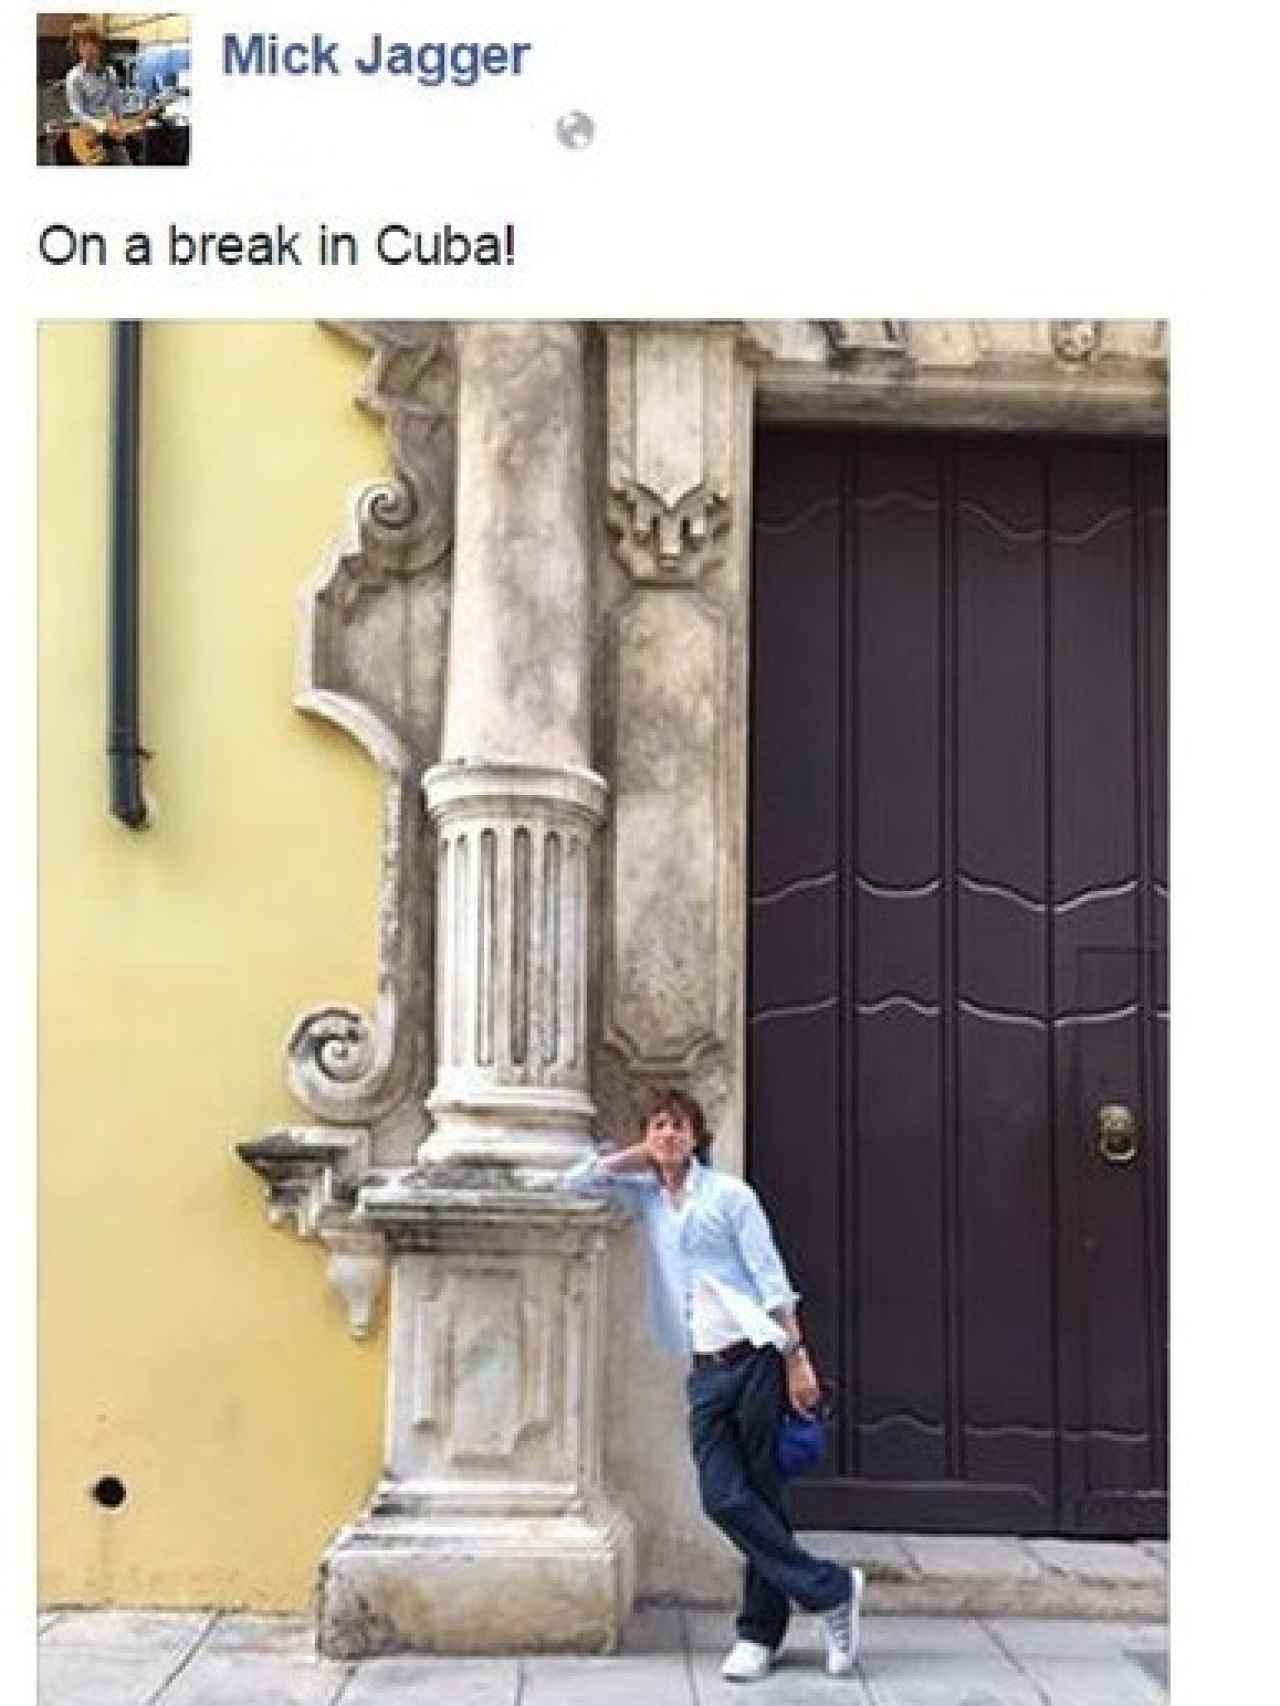 Mick Jagger en La Habana, en octubre 2015.